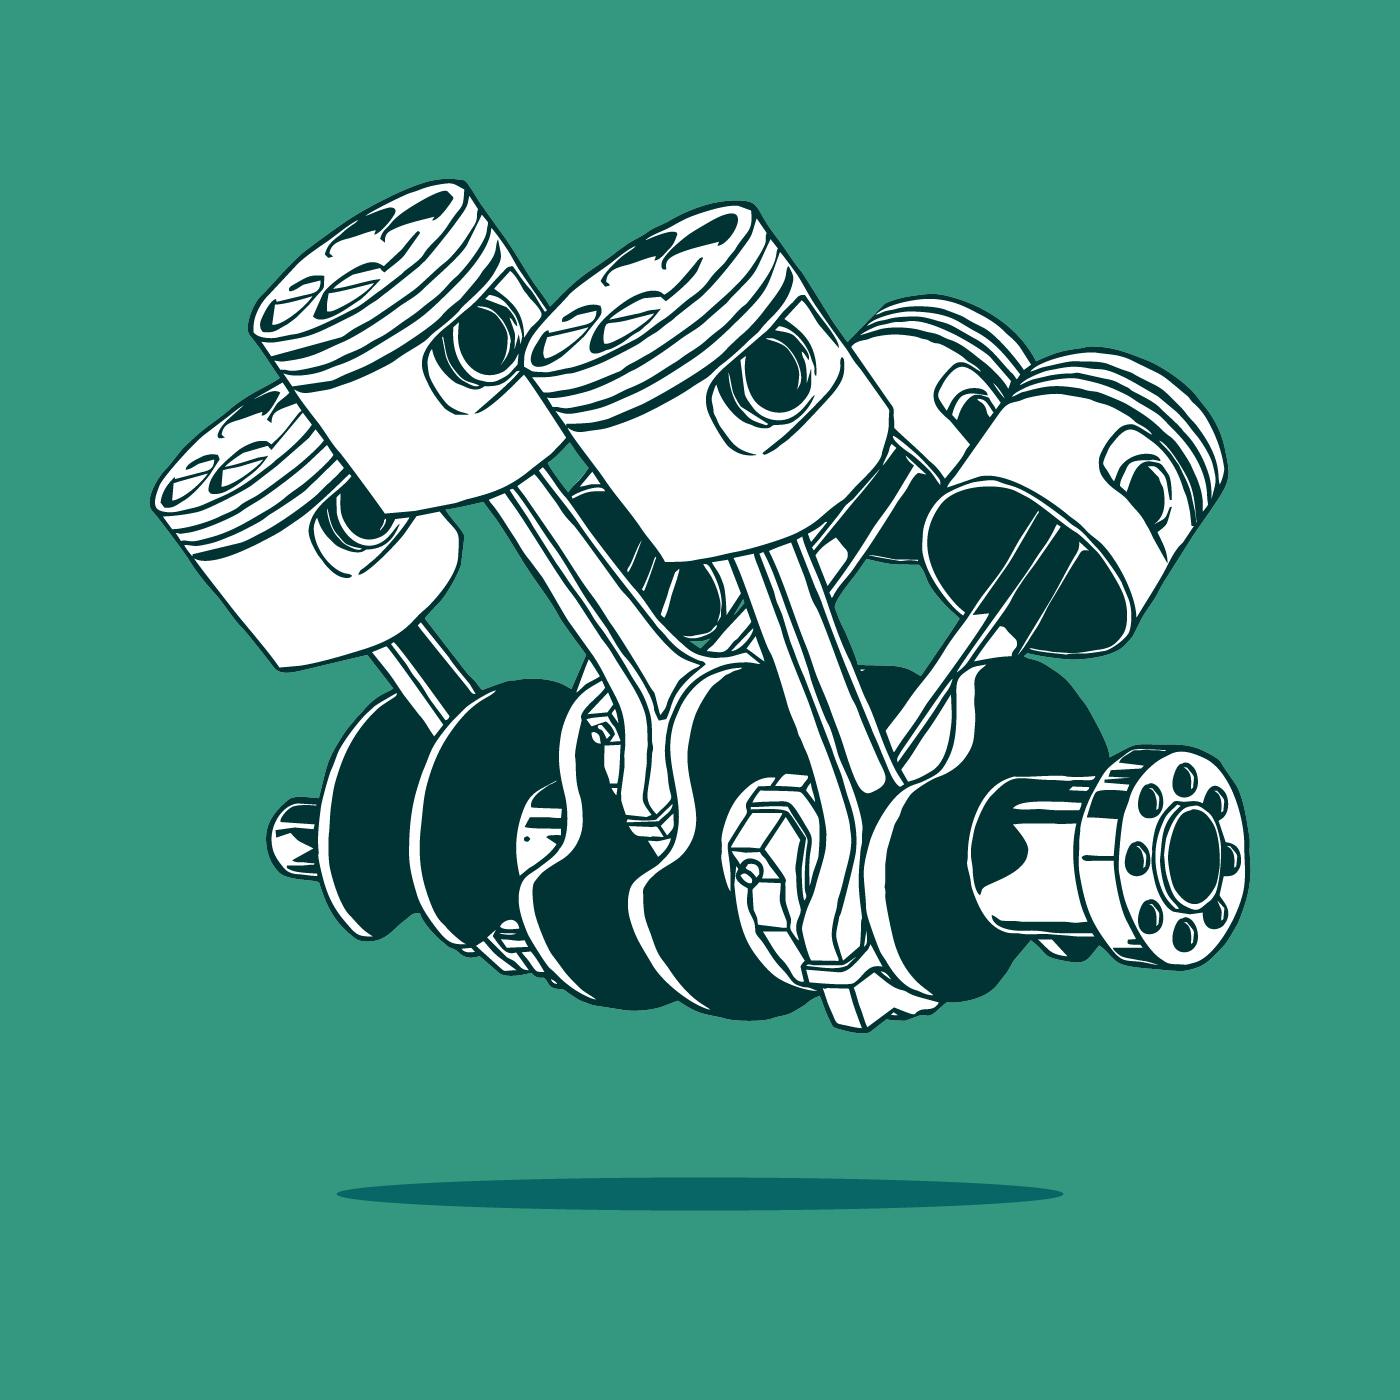 piston free vector art 5167 free downloads